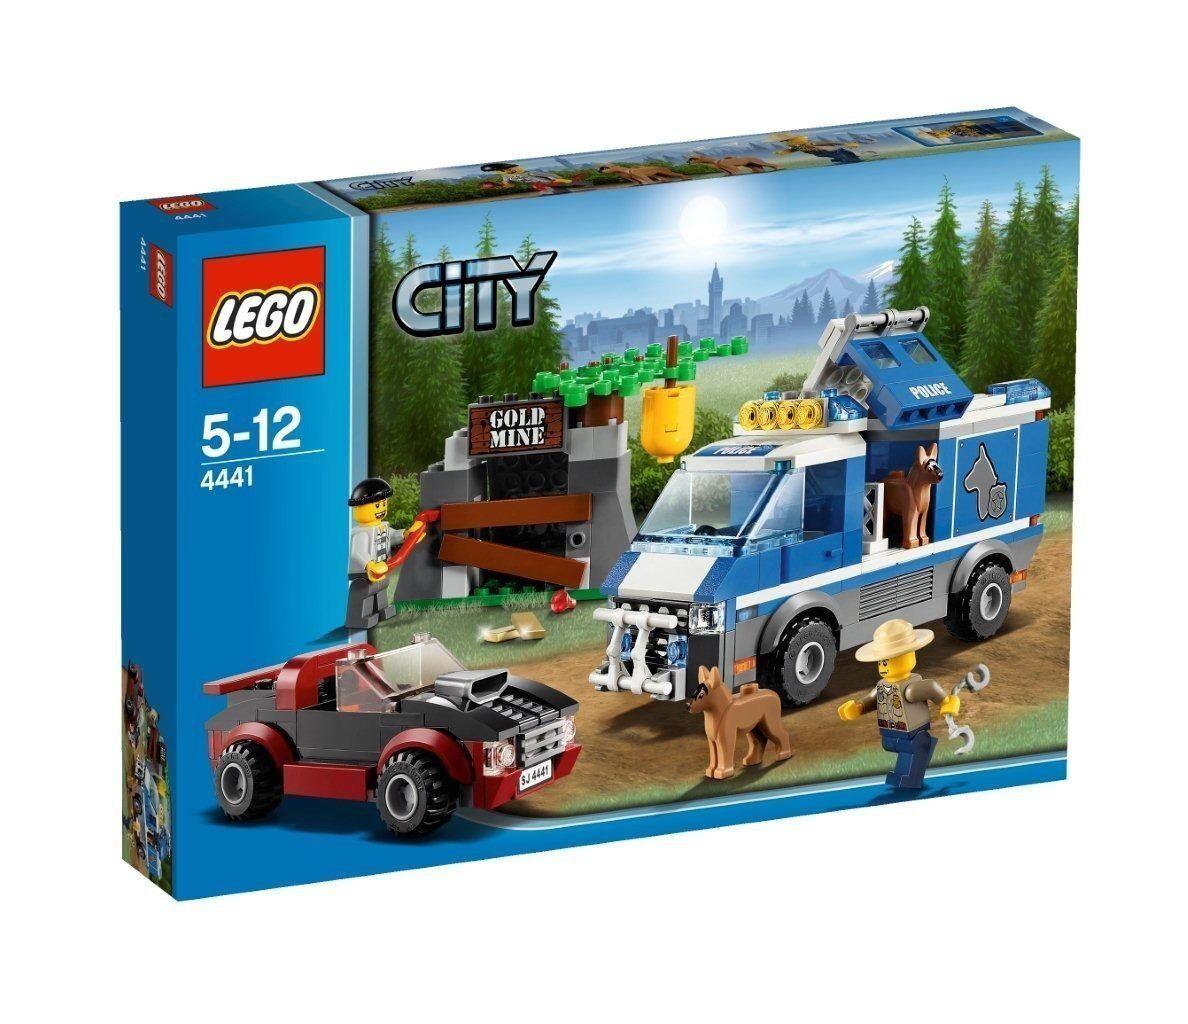 Lego City 4441 Mountain POLICE DOG VAN Gold Mine Sports Car Roadster Robber NISB